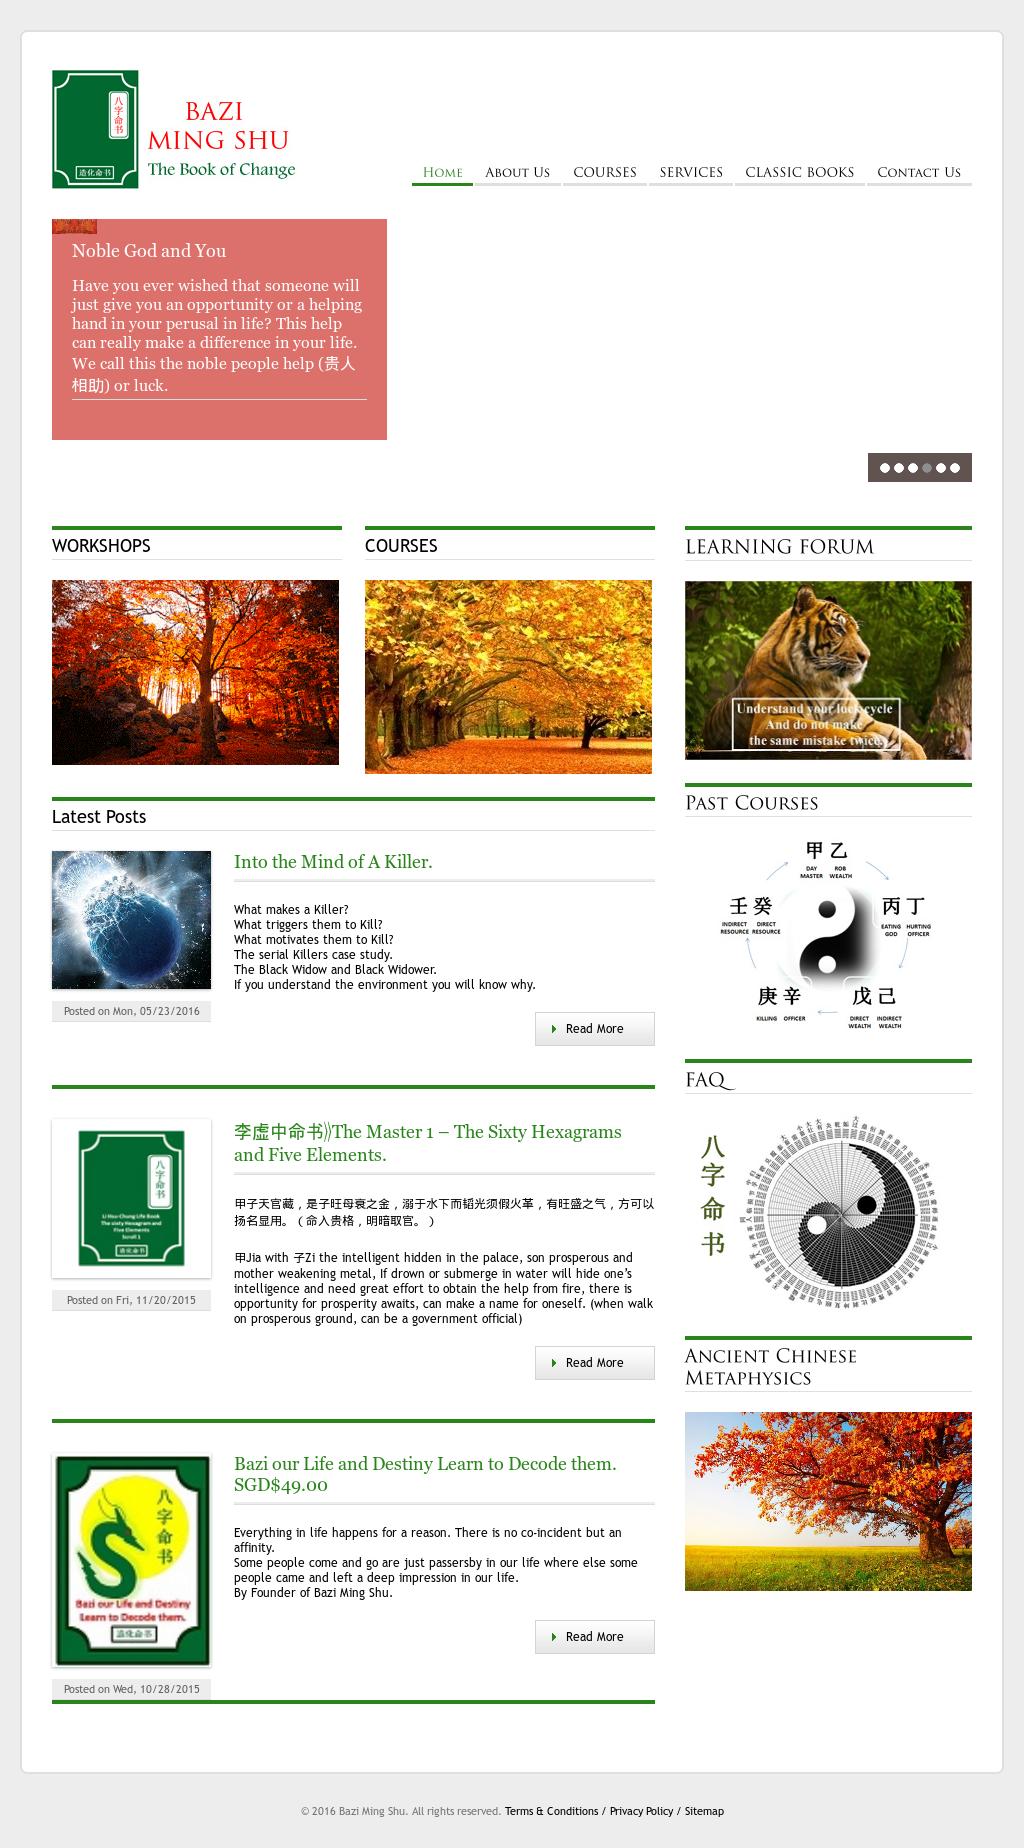 Bazi Ming Shu Competitors, Revenue and Employees - Owler Company Profile